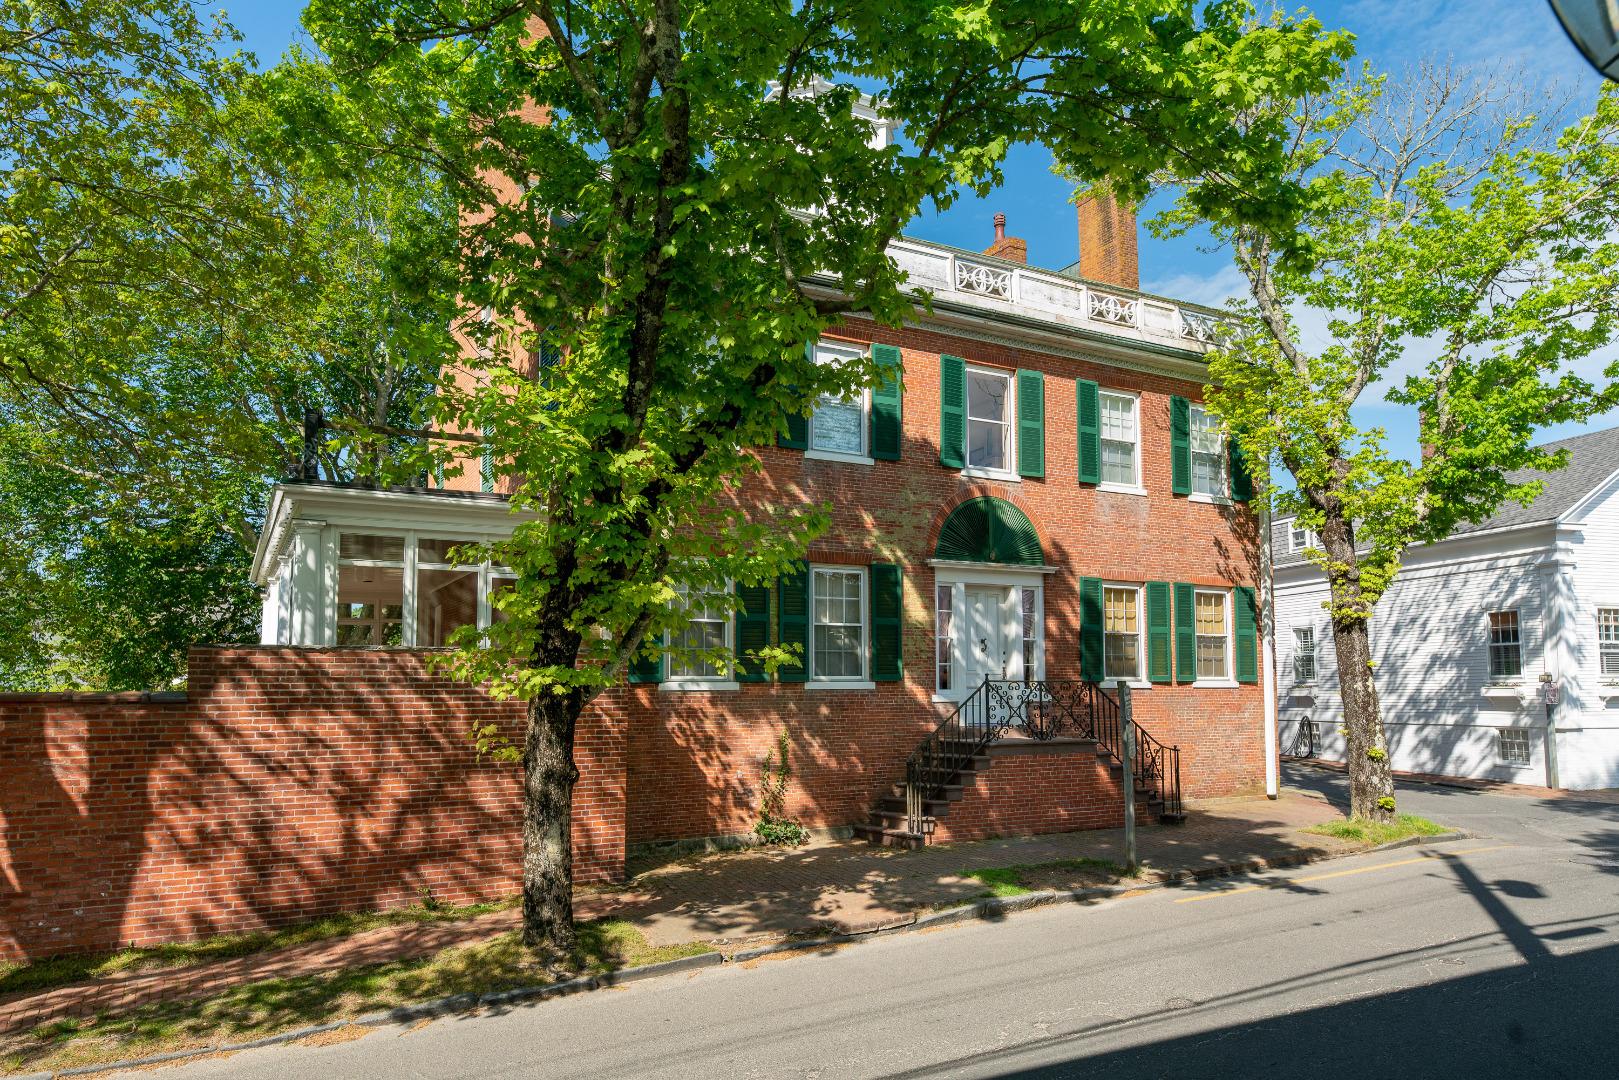 19 Pleasant, 2 Mill Street, 9 & 11 Candlehouse Ln.